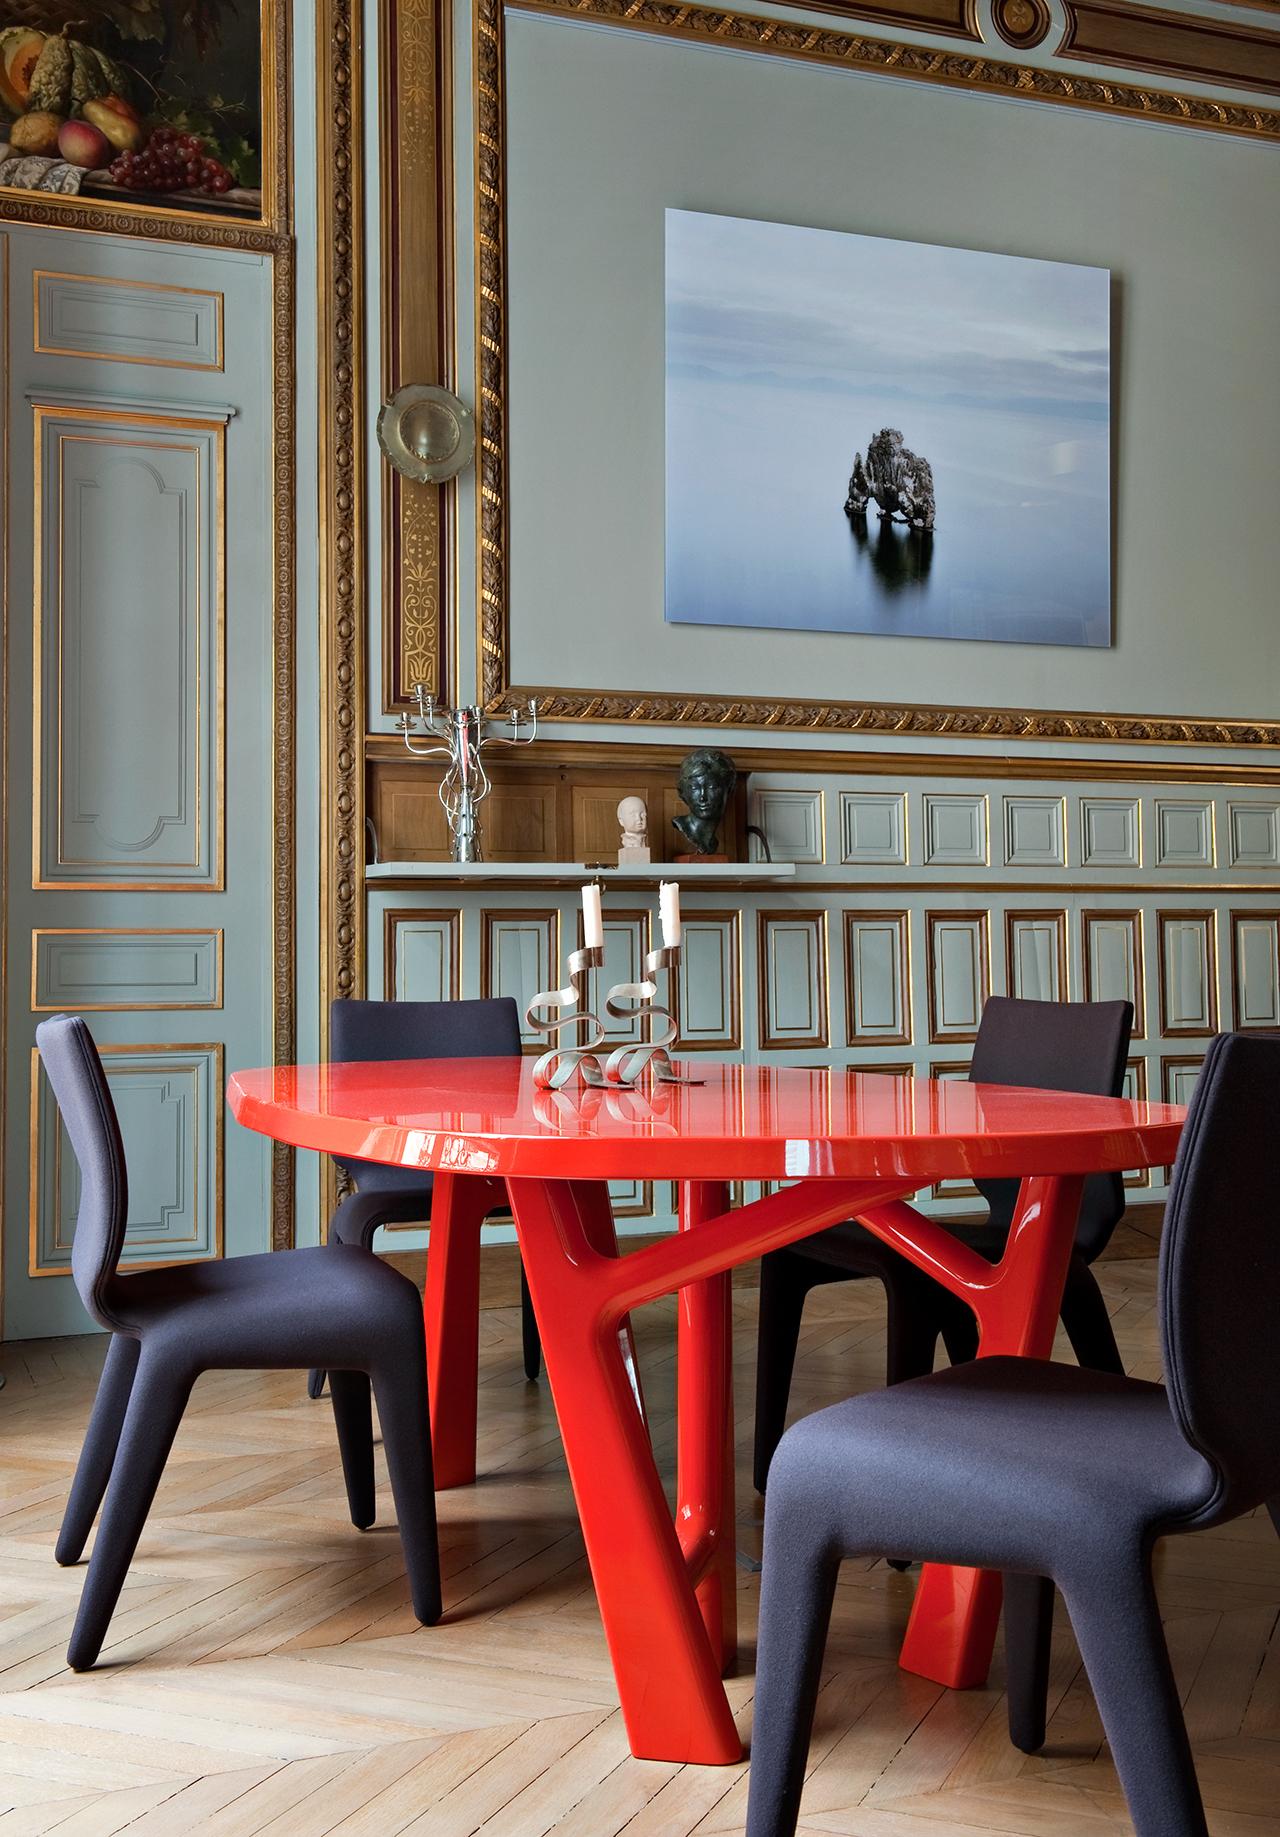 BOUTIQUE MAKEOVER,Paris, France.InteriorDesign byKlavs Rosenfalck,Photography by Nicolas Mathéus / Elle Décoration / Scoop, fromKaleidoscope©Gestalten2016.